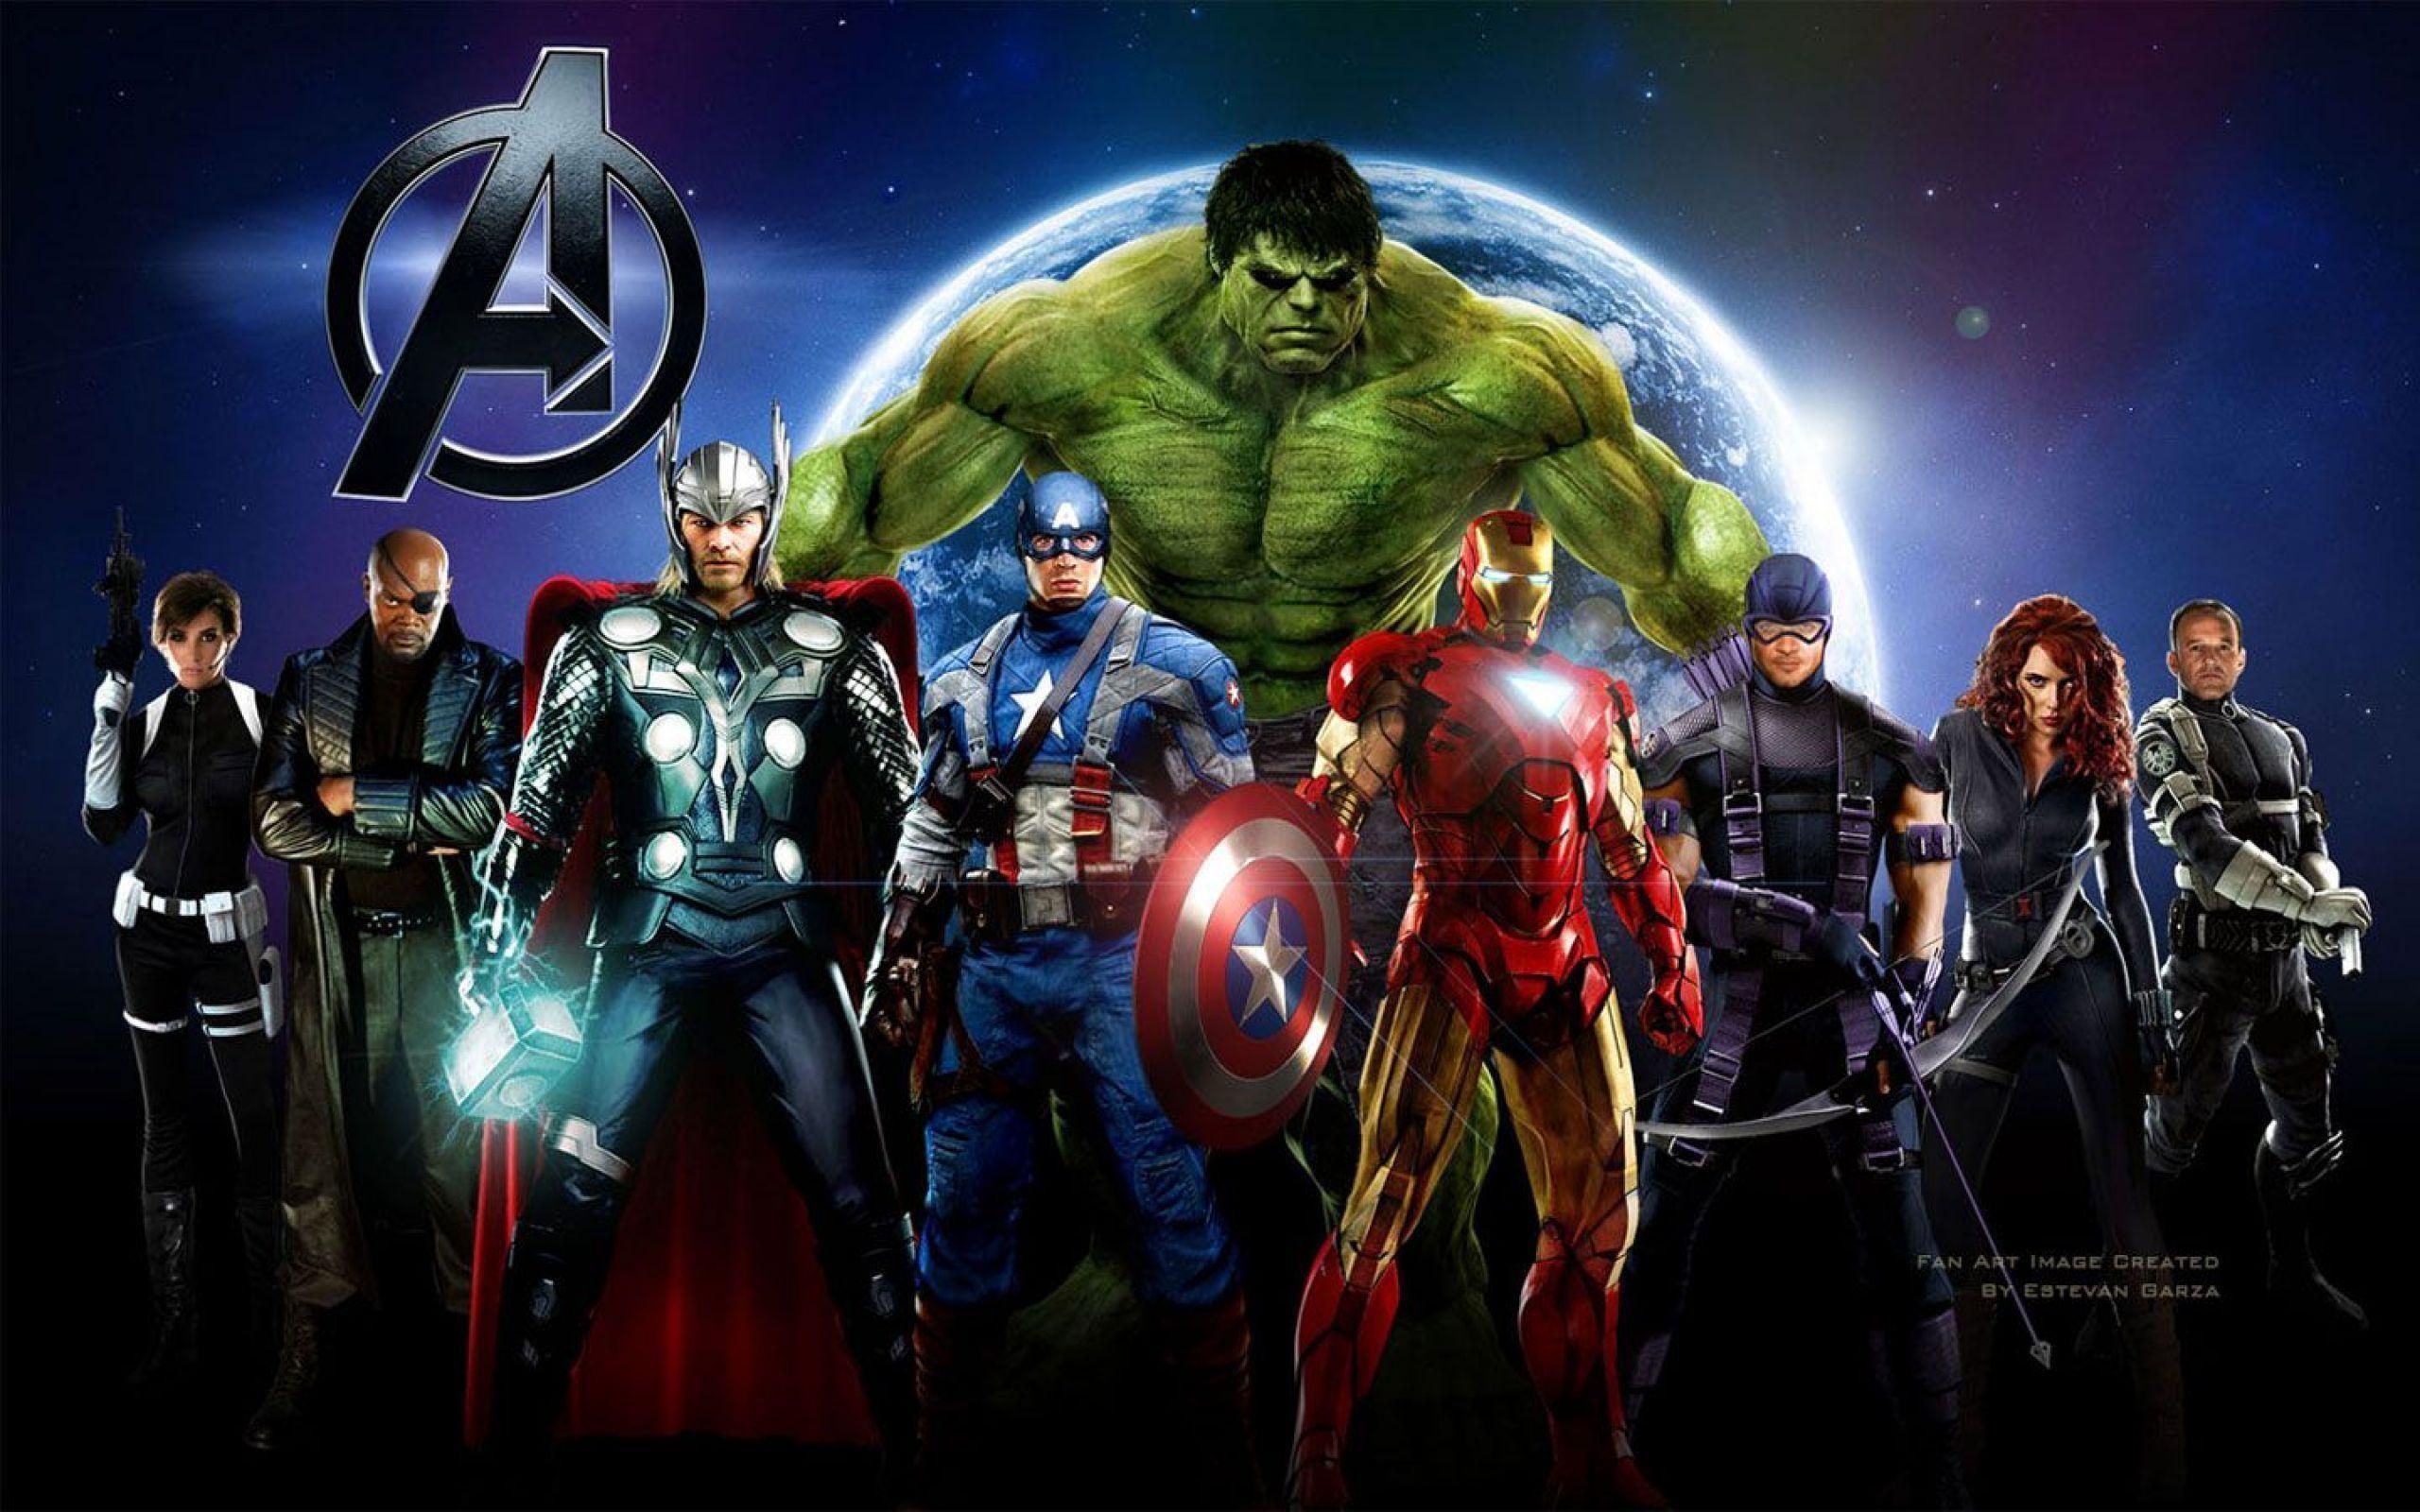 Avengers Age Of Ultron Wallpaper – wallpaper.